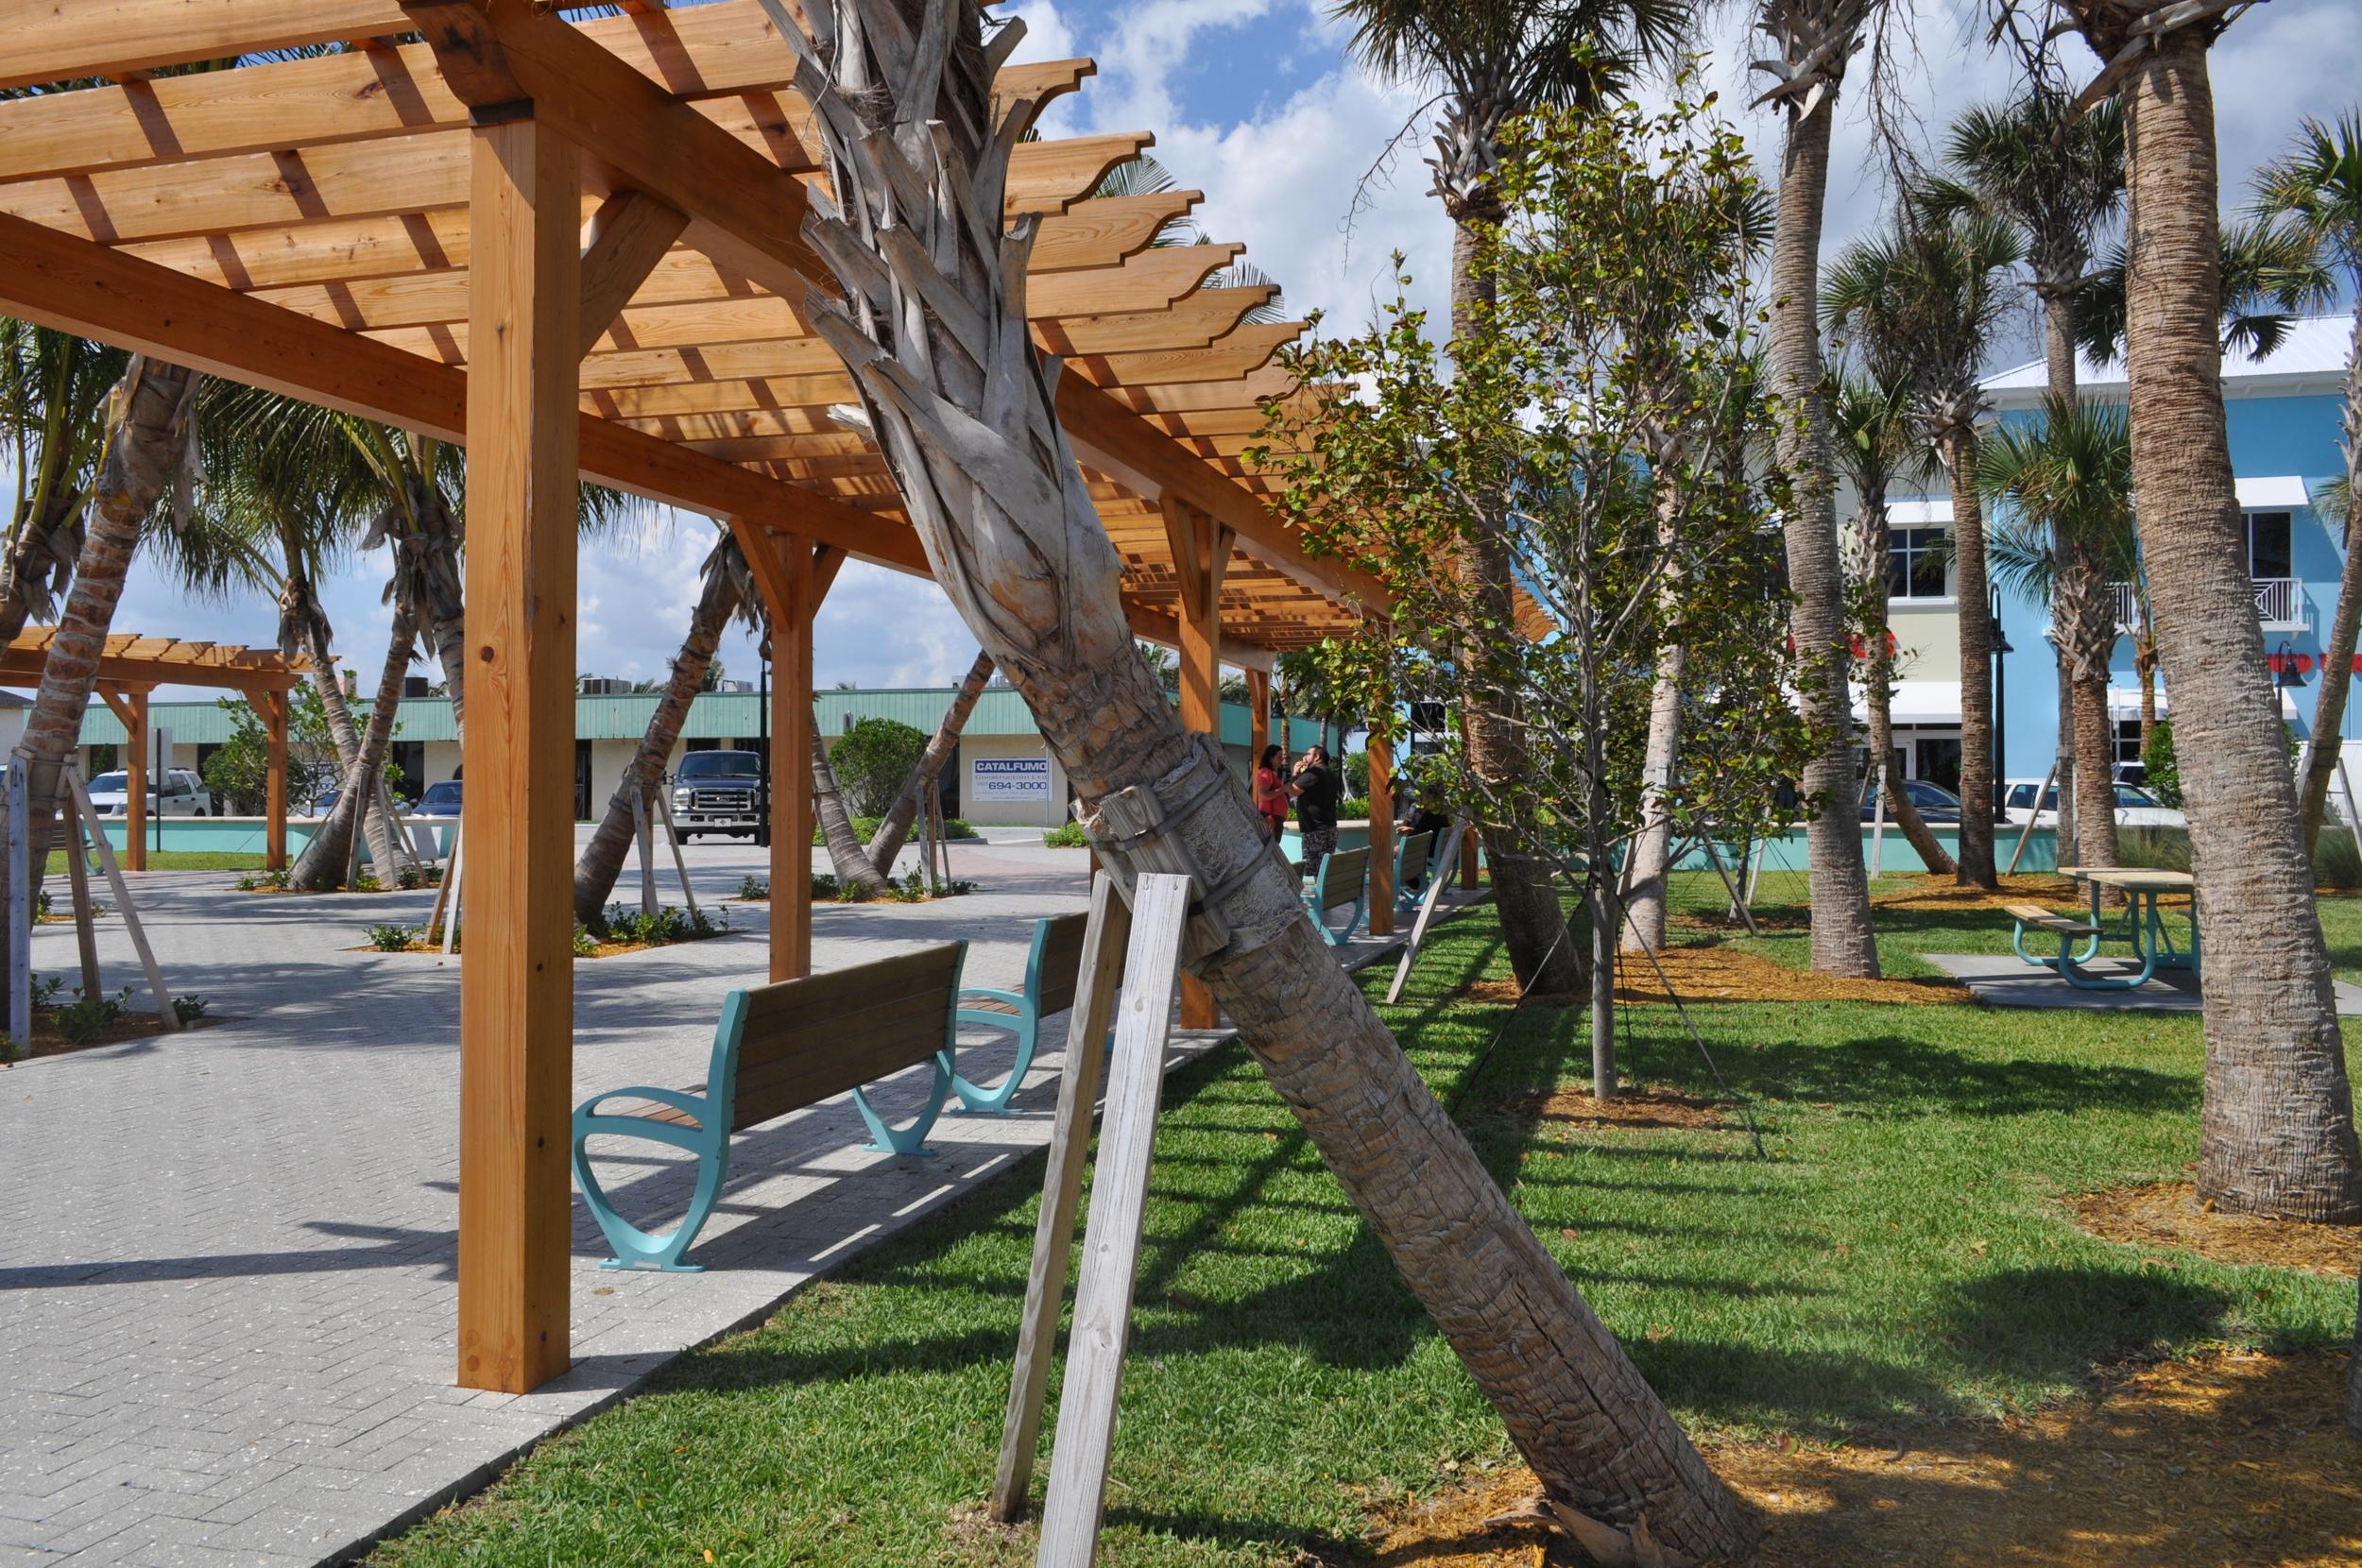 City of Riviera Beach Municipal Beach Park Ocean Mall Trellis with Seating.jpg